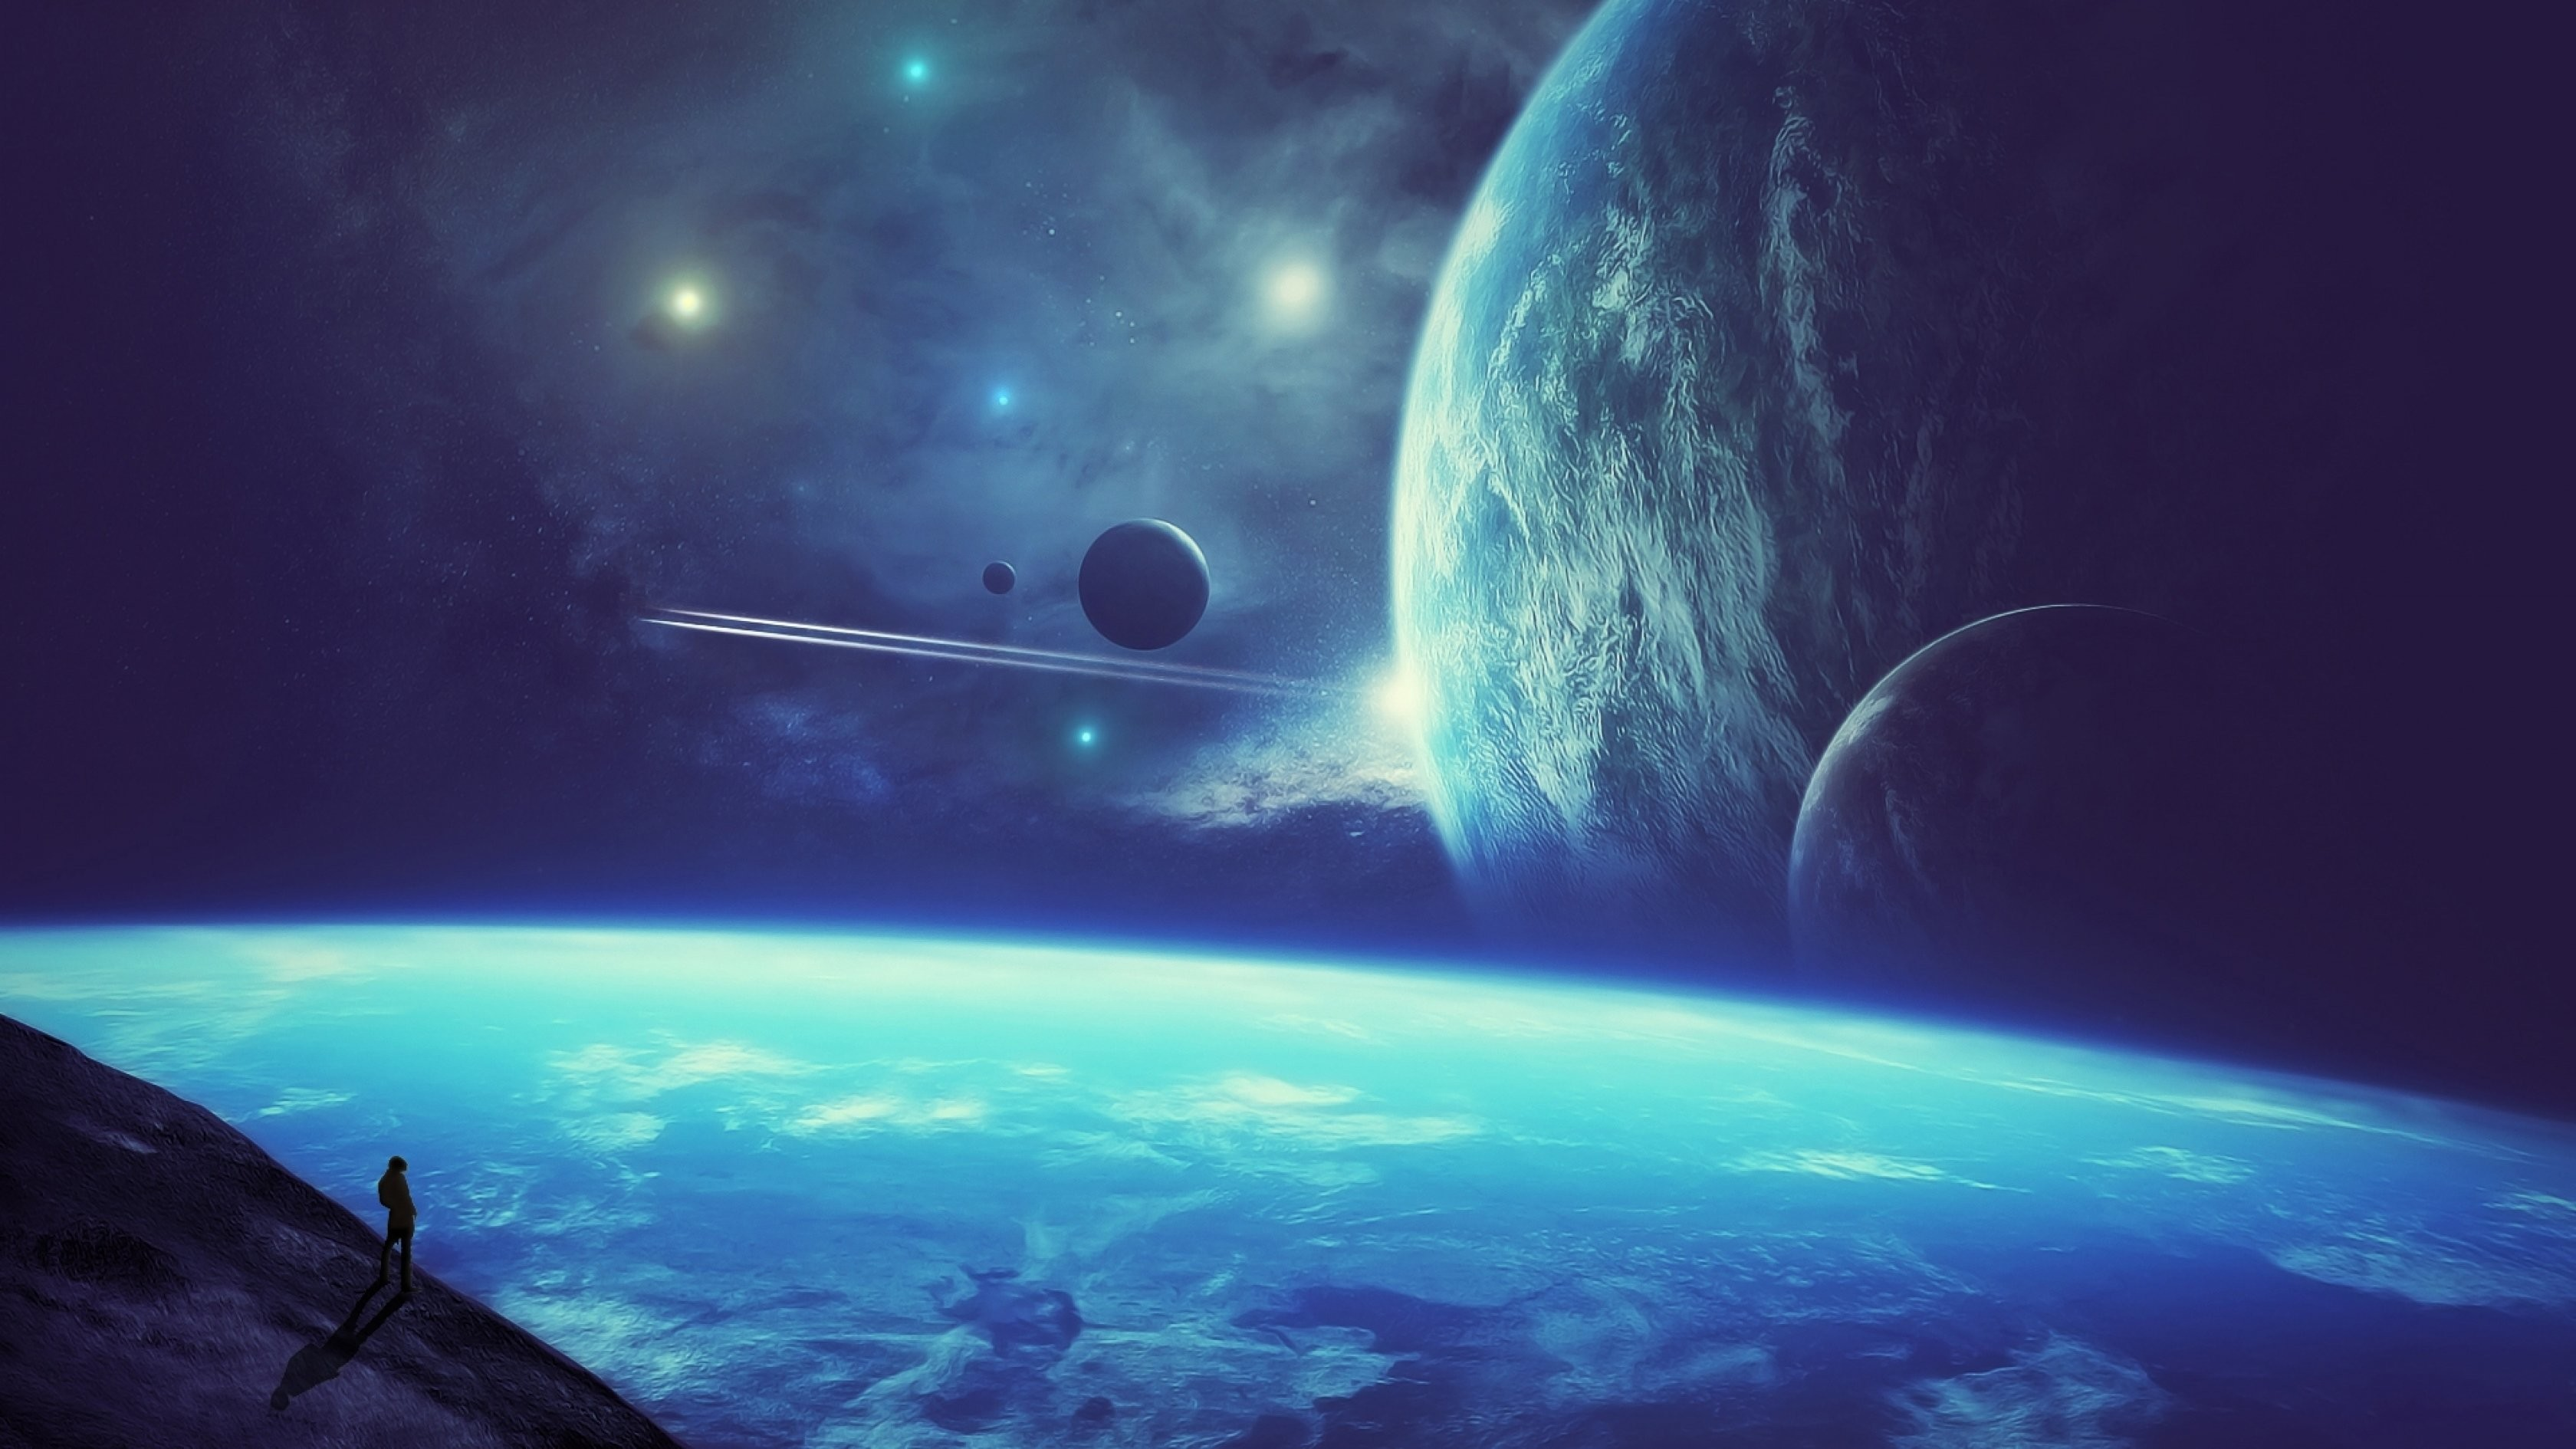 Planetscape sci-fi planet landscape space art artwork wallpaper      660348   WallpaperUP